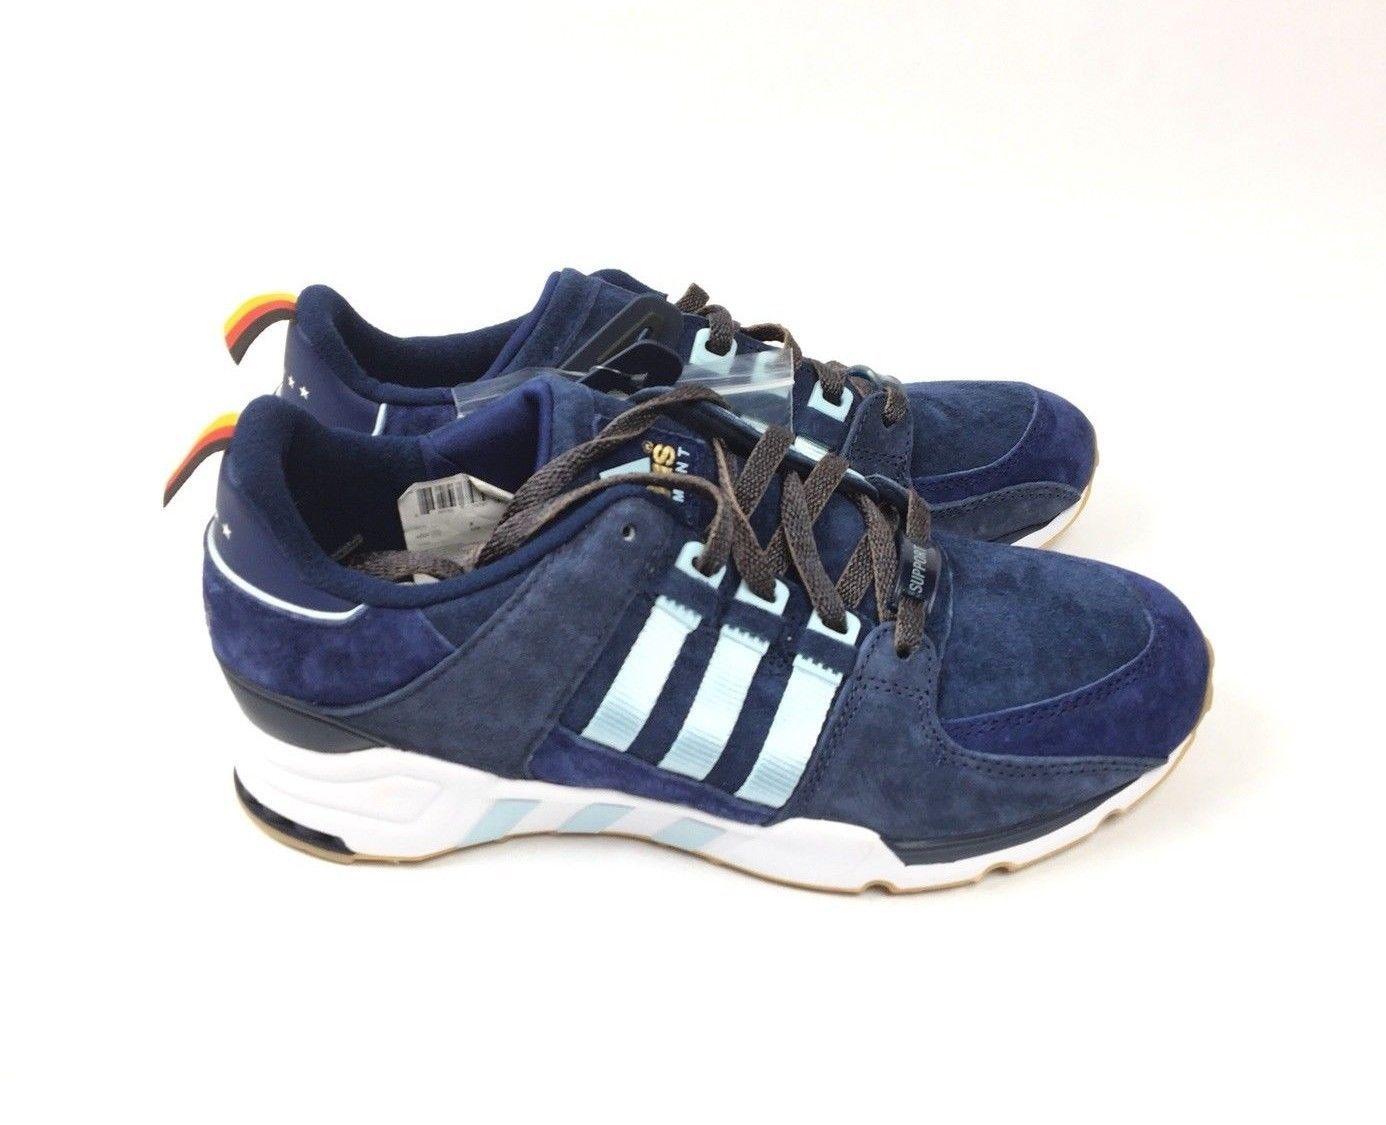 281c0ec97d57 New Adidas EQT 93 Equipment Berlin Marathon LTD Men Size 8 Navy Ice Blue  B27662